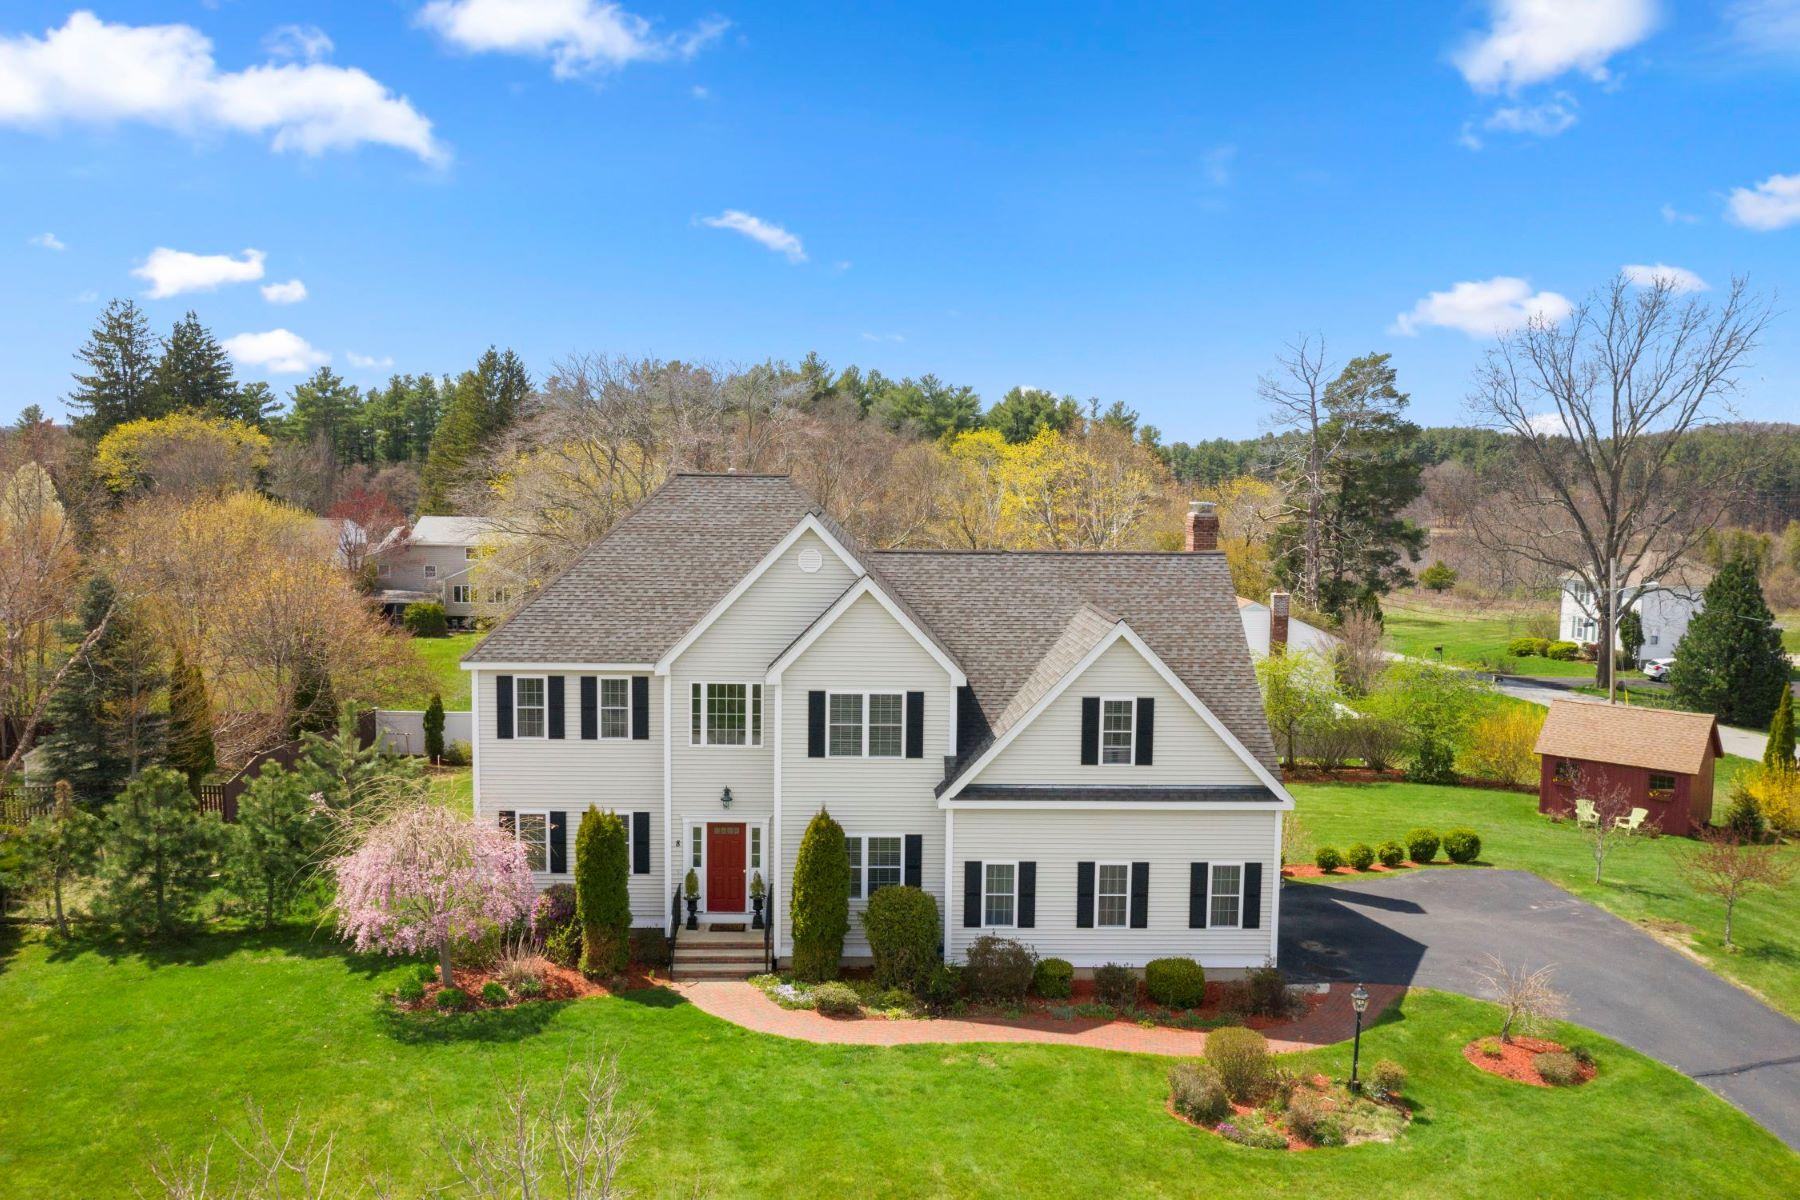 Single Family Homes for Active at 8 Kallander Drive 8 Kallander Dr Southborough, Massachusetts 01772 United States